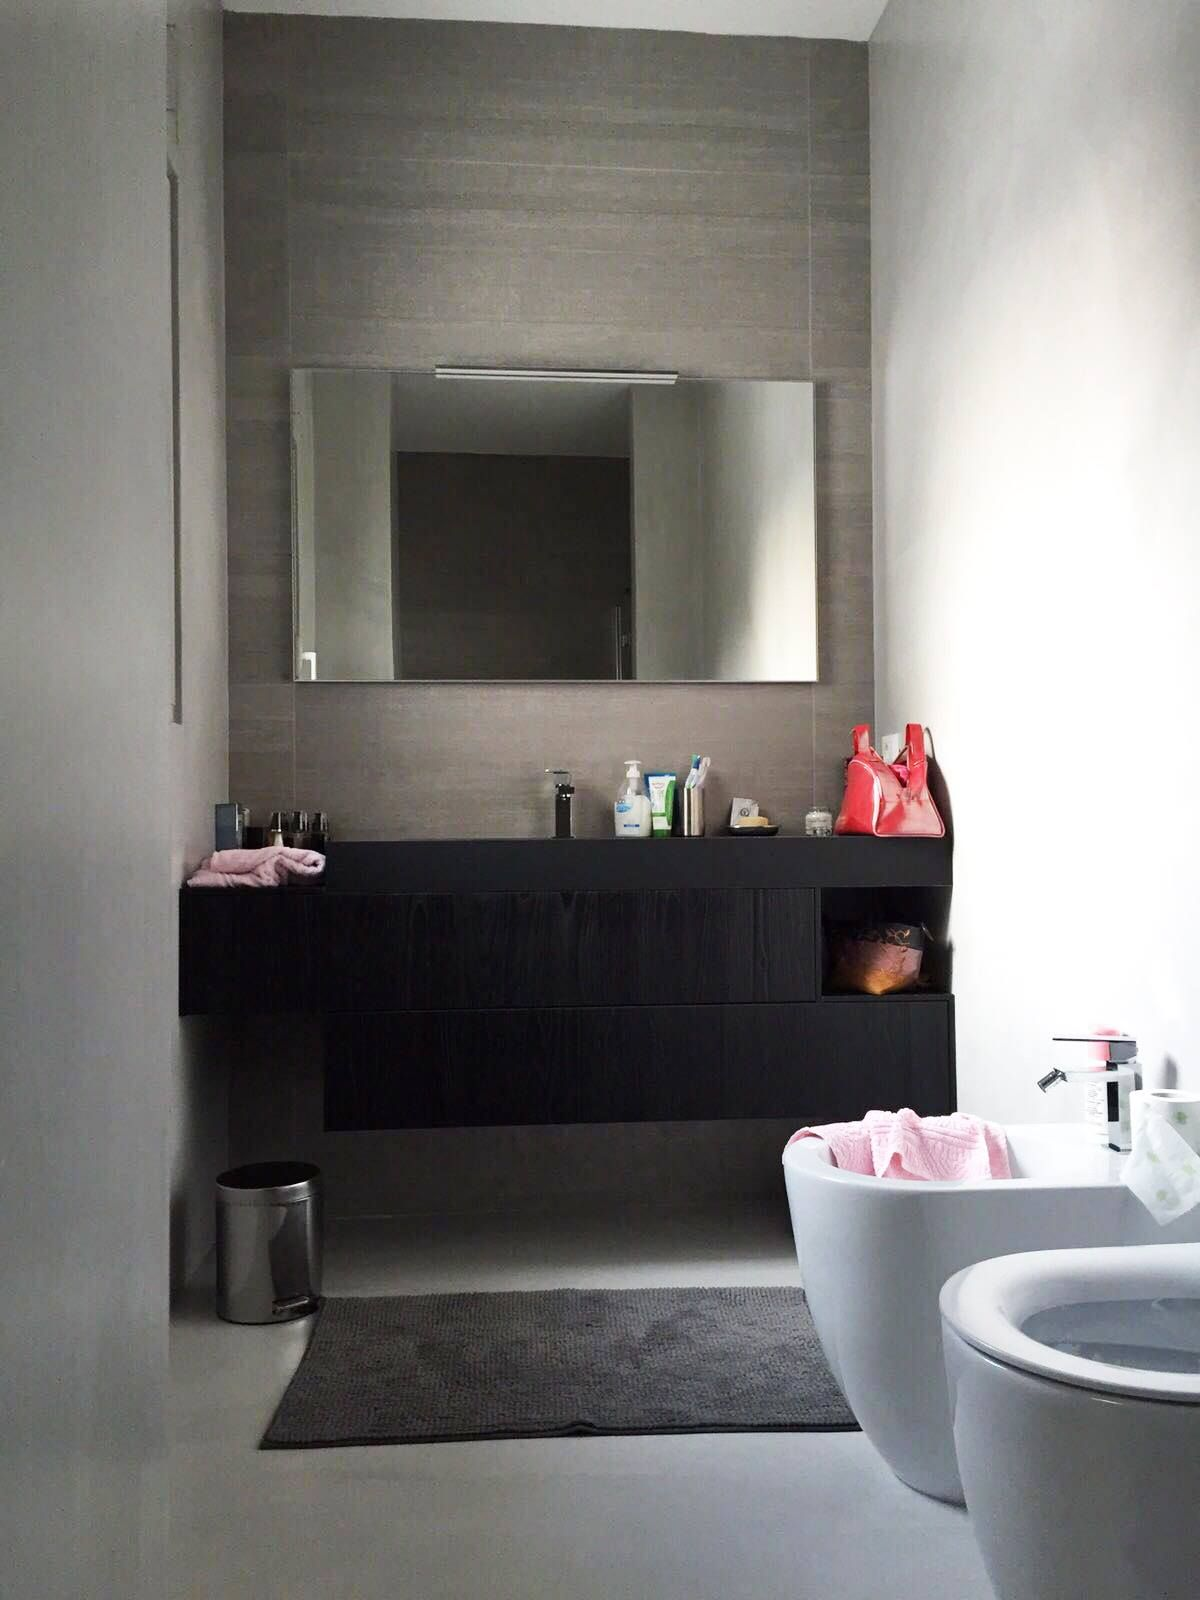 Mobili bagno Sense: arredo bagno di design  Un, As and Teak